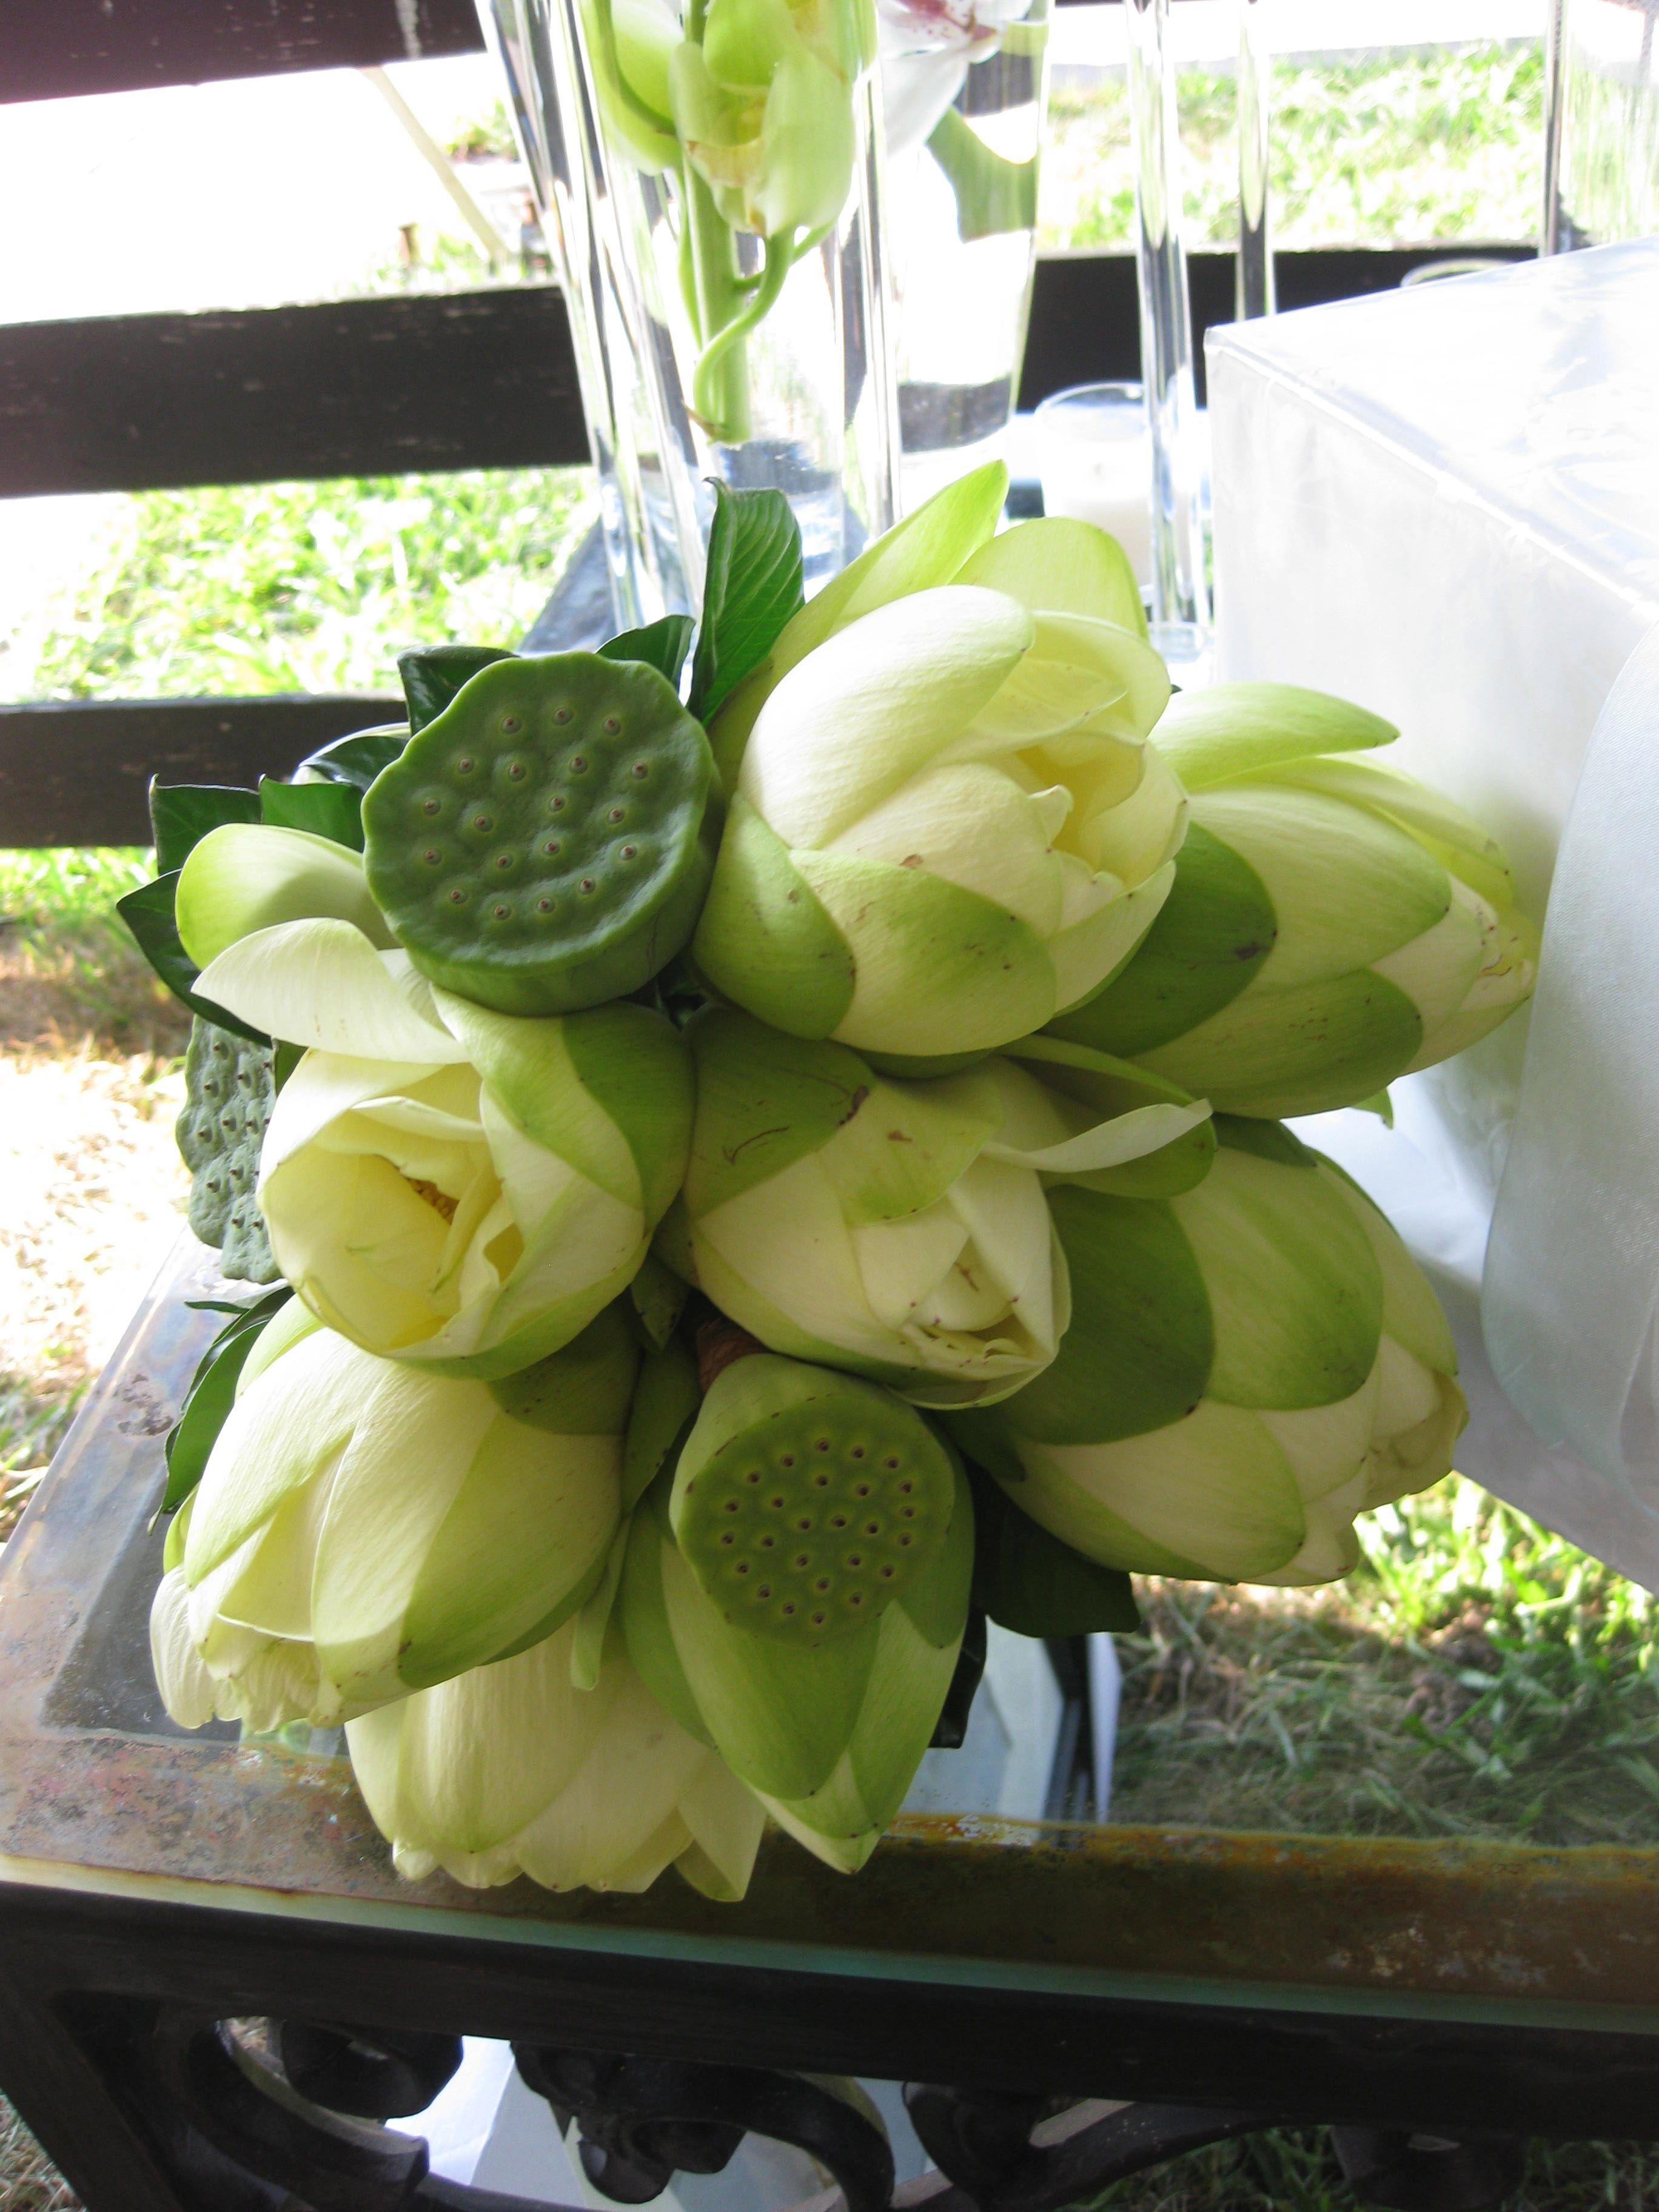 Lotus flower wedding wedding ideas pinterest wedding flowers lotus flower wedding modern flower arrangements wedding arrangements diy bouquet flower bouquet wedding izmirmasajfo